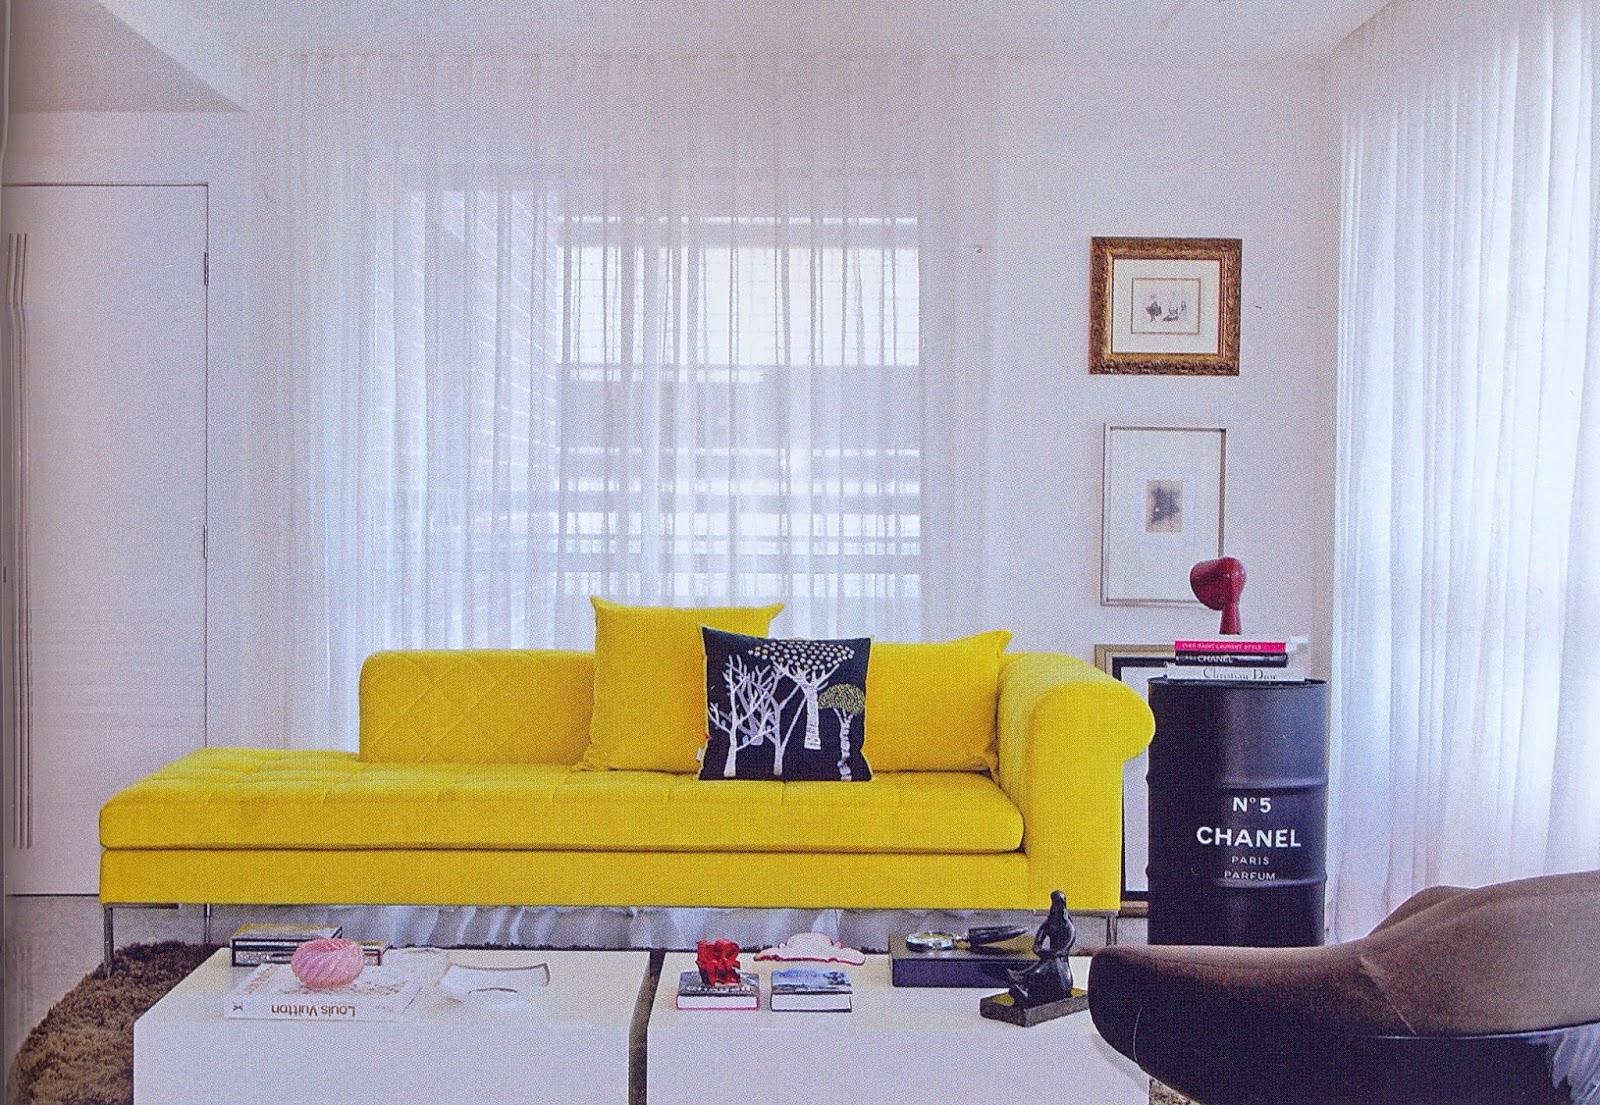 Construindo Minha Casa Clean D Vida De Decora O Da Leitora Sala  -> Cor De Parede Para Sala Amarelo